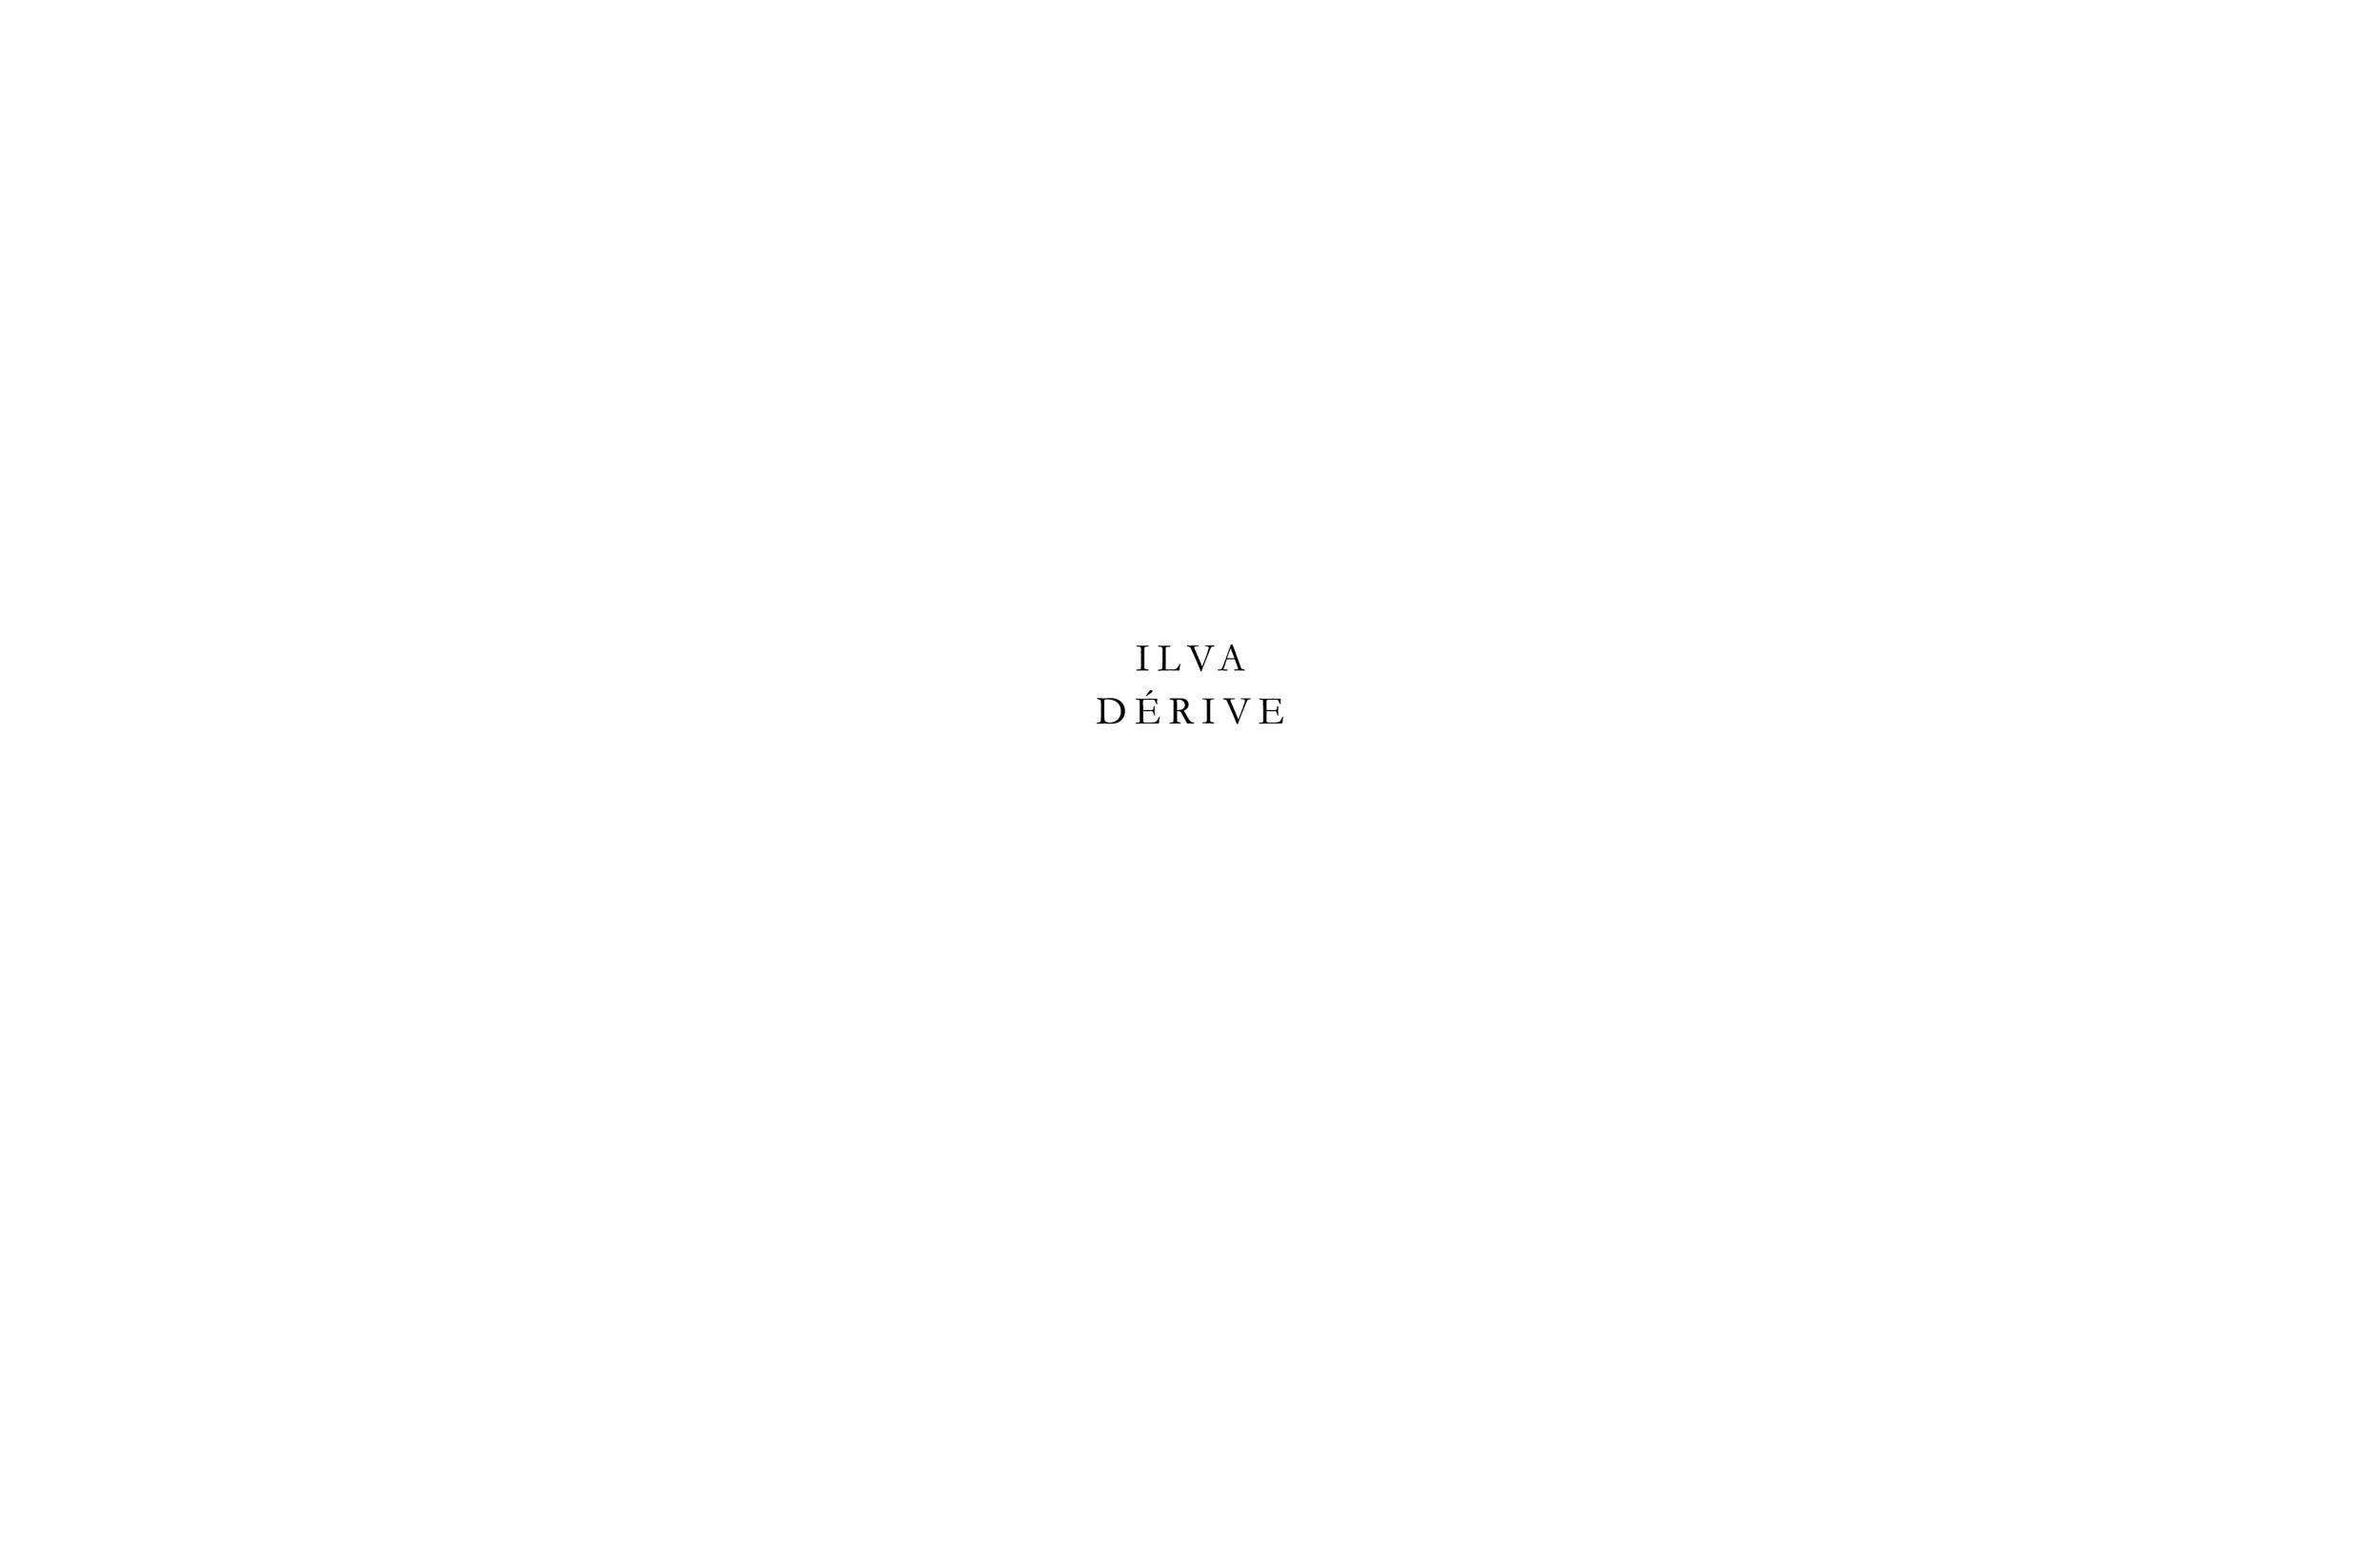 MM_FW17_Lookbook_Fine_Derive_Digital3.png